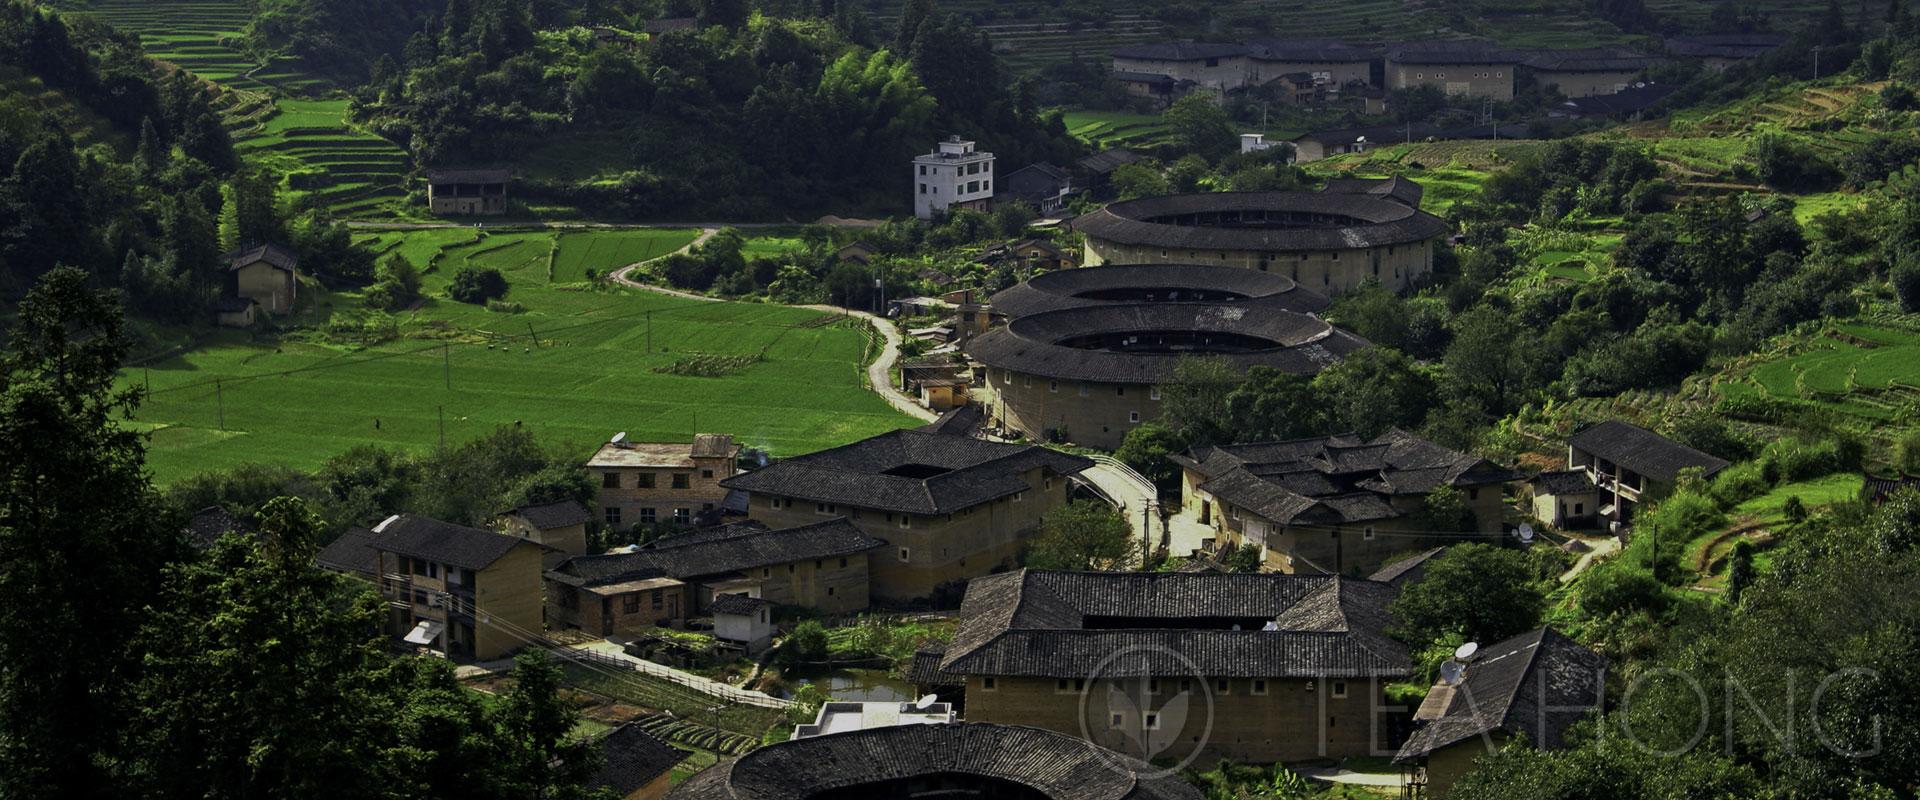 Hakka village in Mindong, Fujian